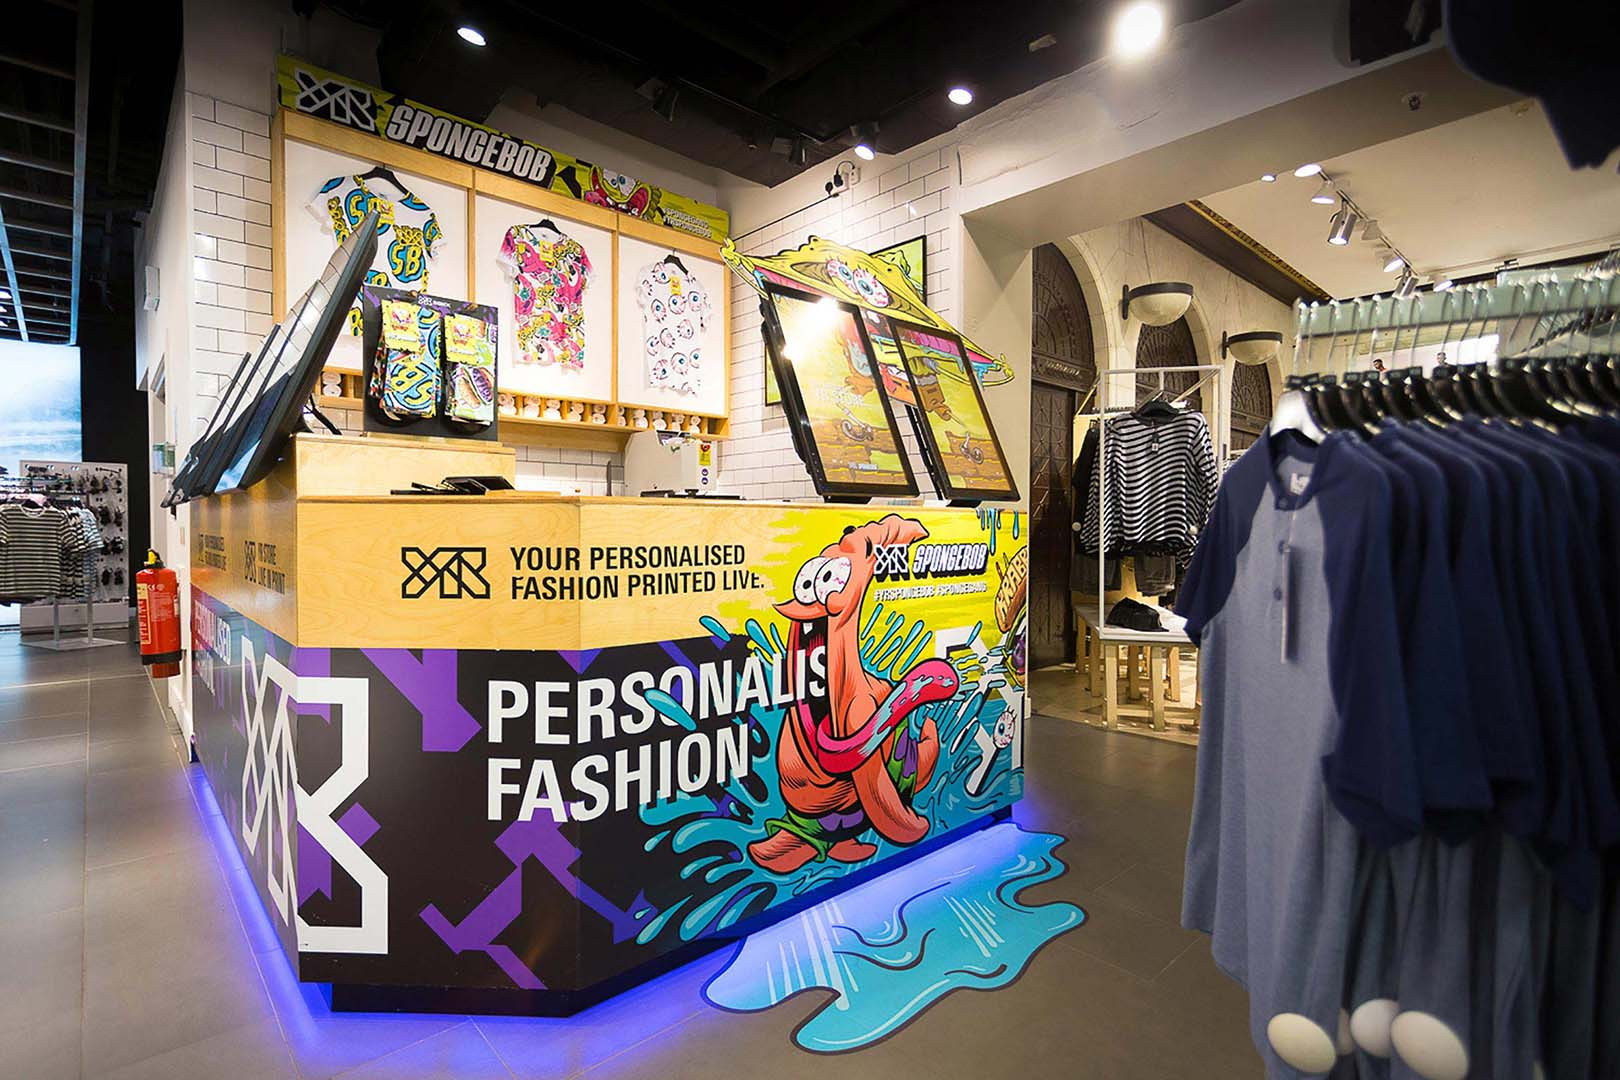 YrStore x Topman Spongebob SquarePants Clothing